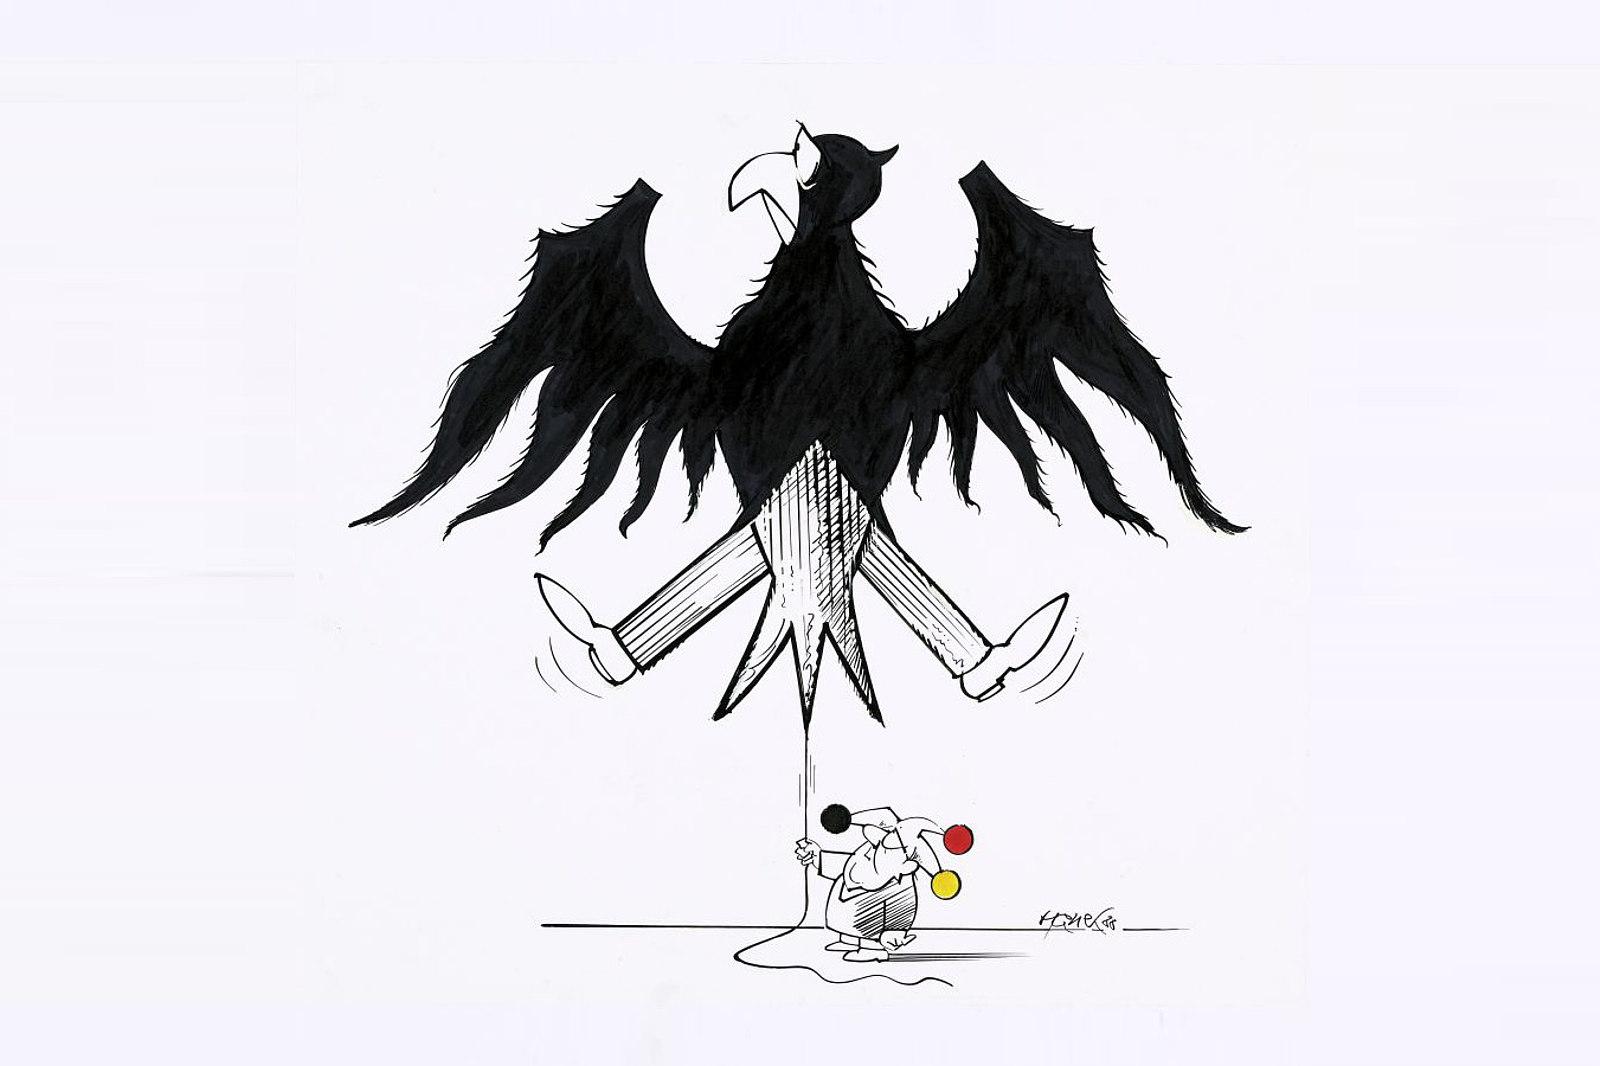 Karikatur mit Bundesadler